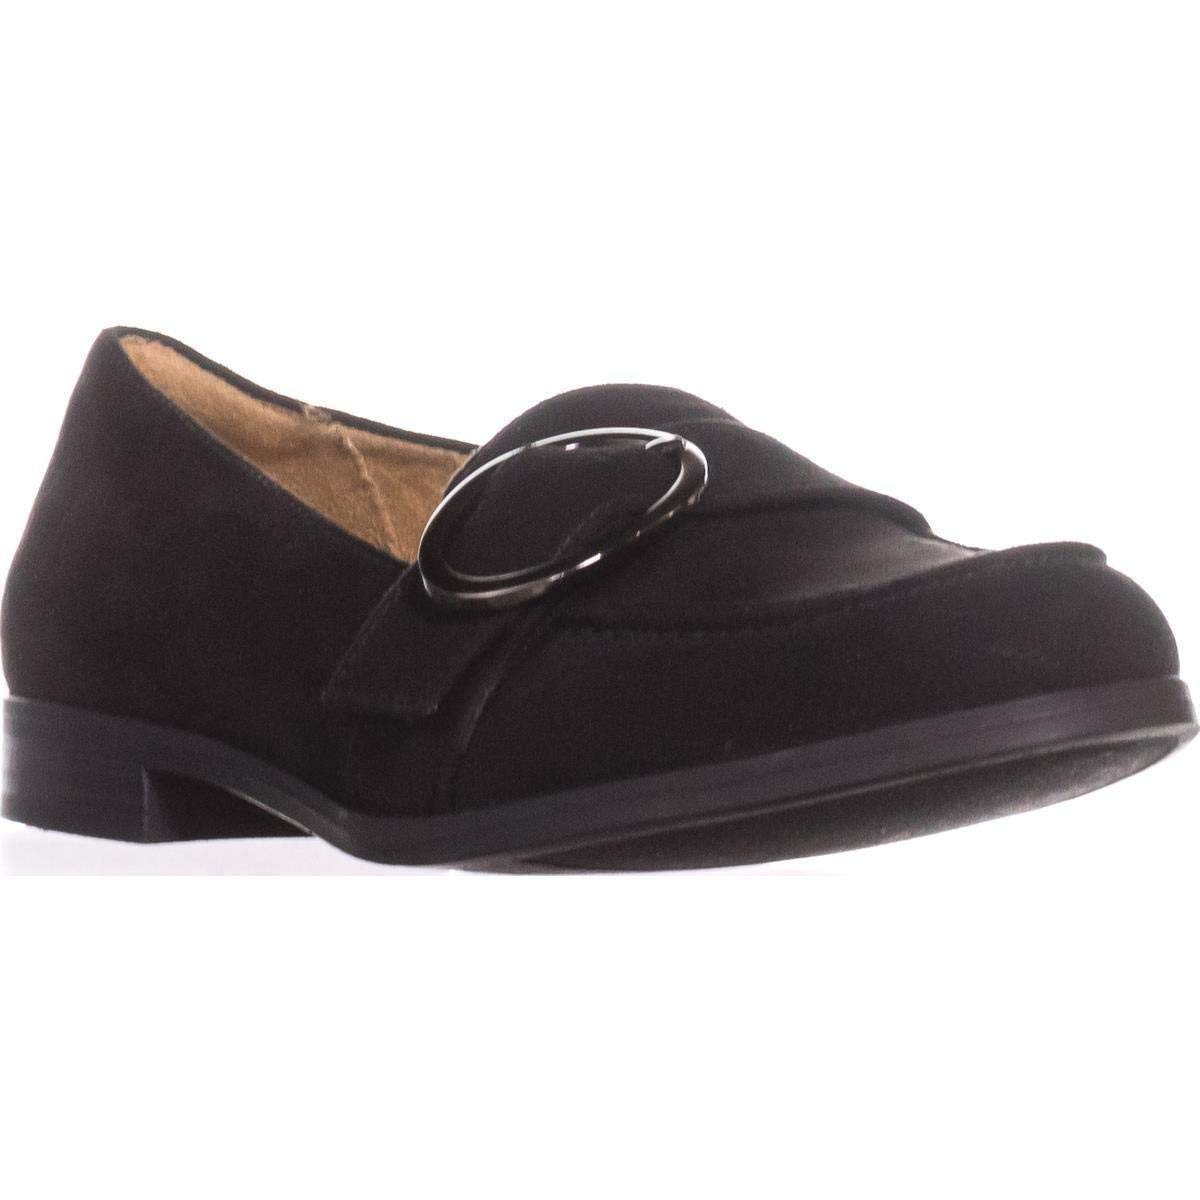 0efa5edbe6f Naturalizer Womens Mina Fabric Almond Toe Loafers